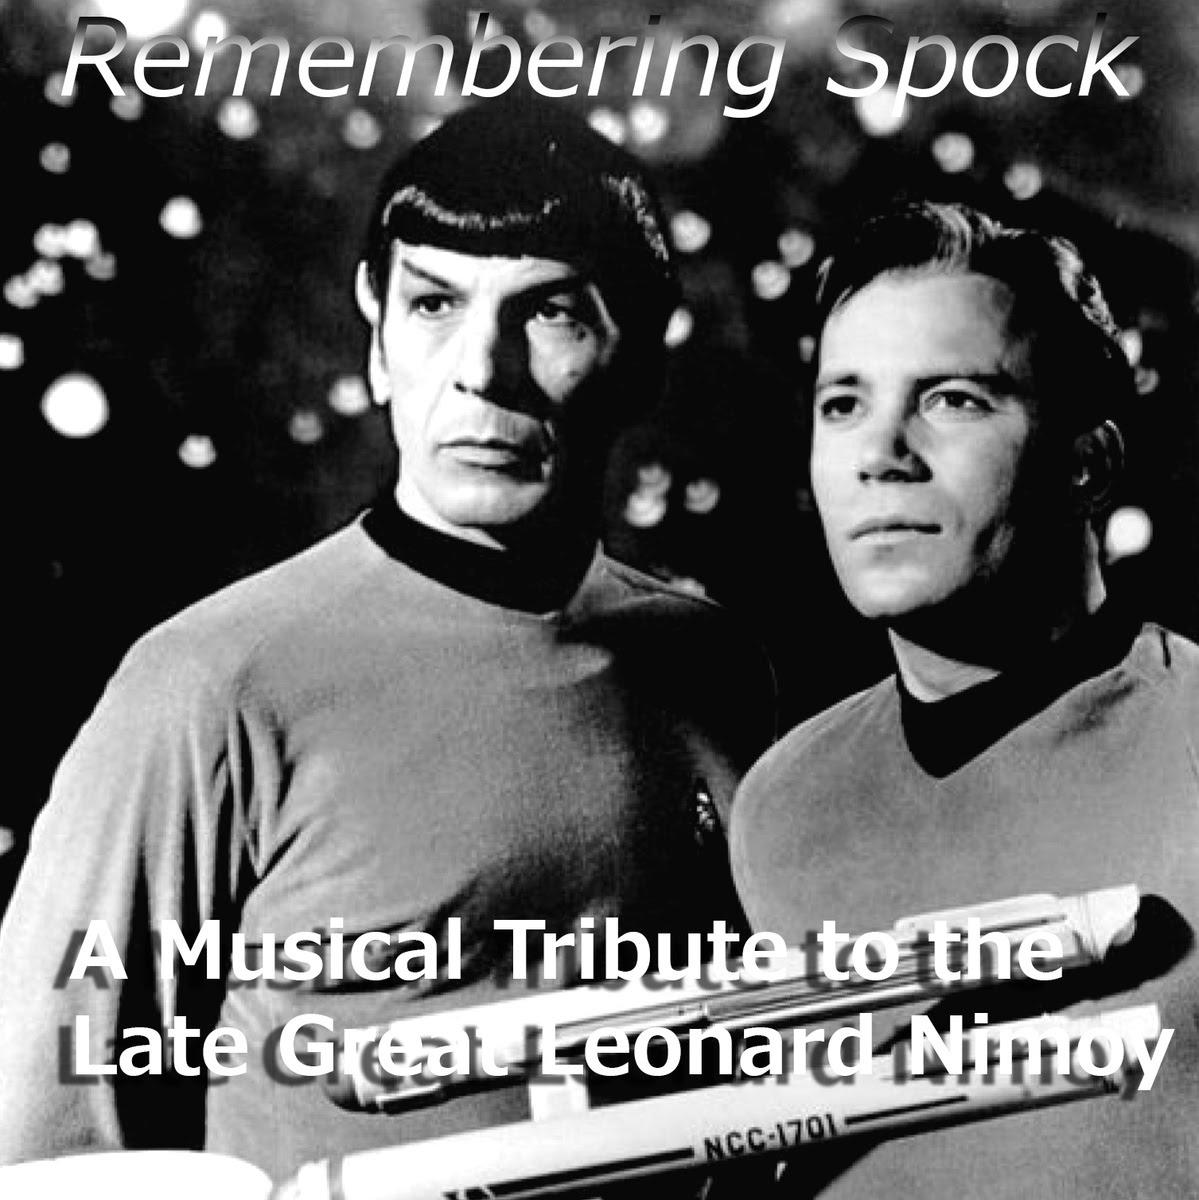 https://bordersedge.bandcamp.com/album/remembering-spock